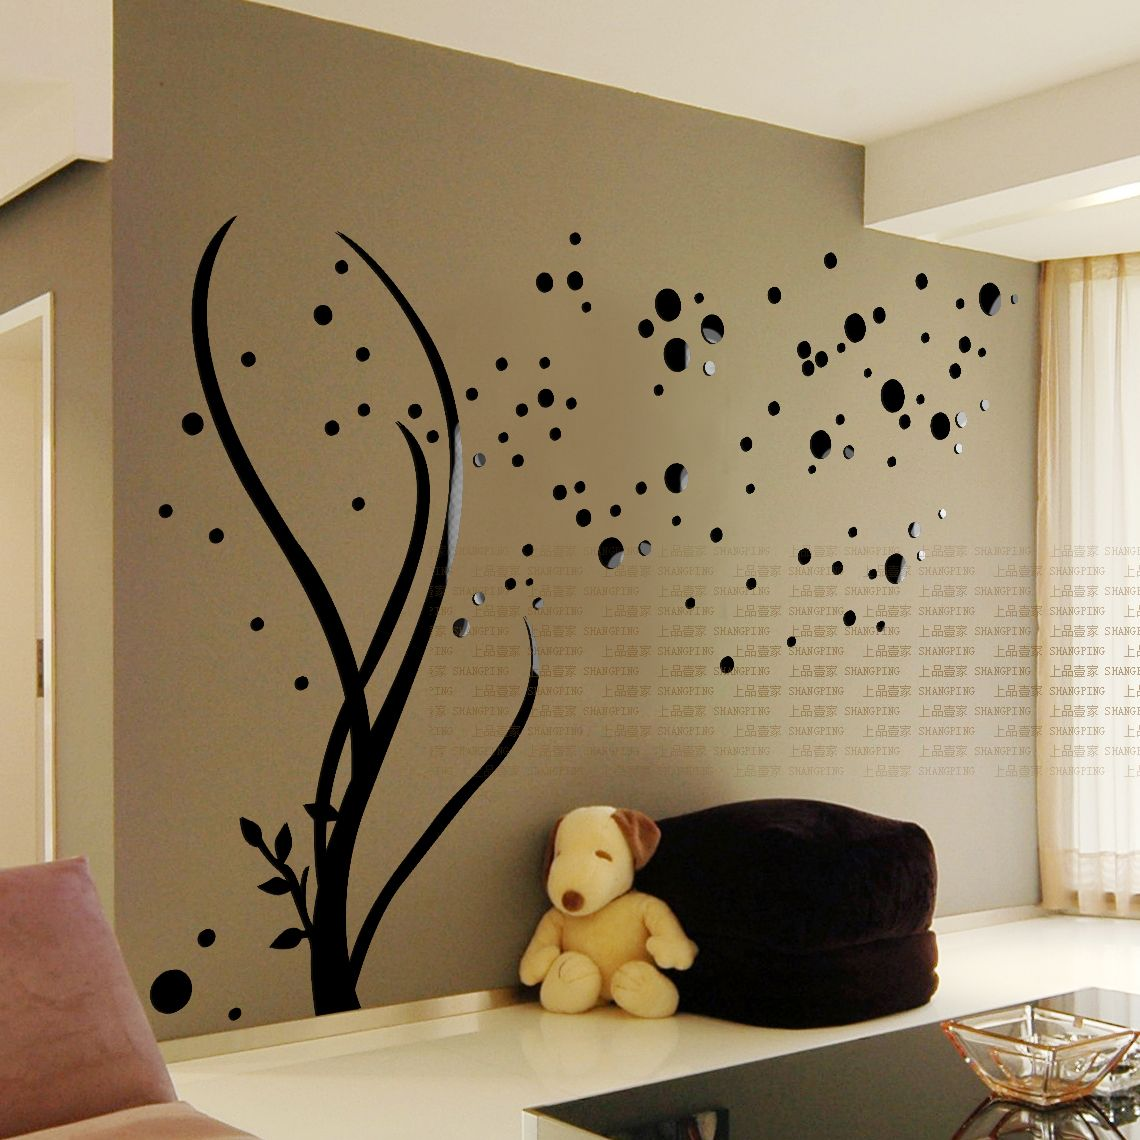 Modern Tv Unit Reviews Online Shopping Reviews On Modern Tv Unit Aliexpress Com Alibaba G Wall Stickers Living Room Wall Decor Stickers Living Wall Decor